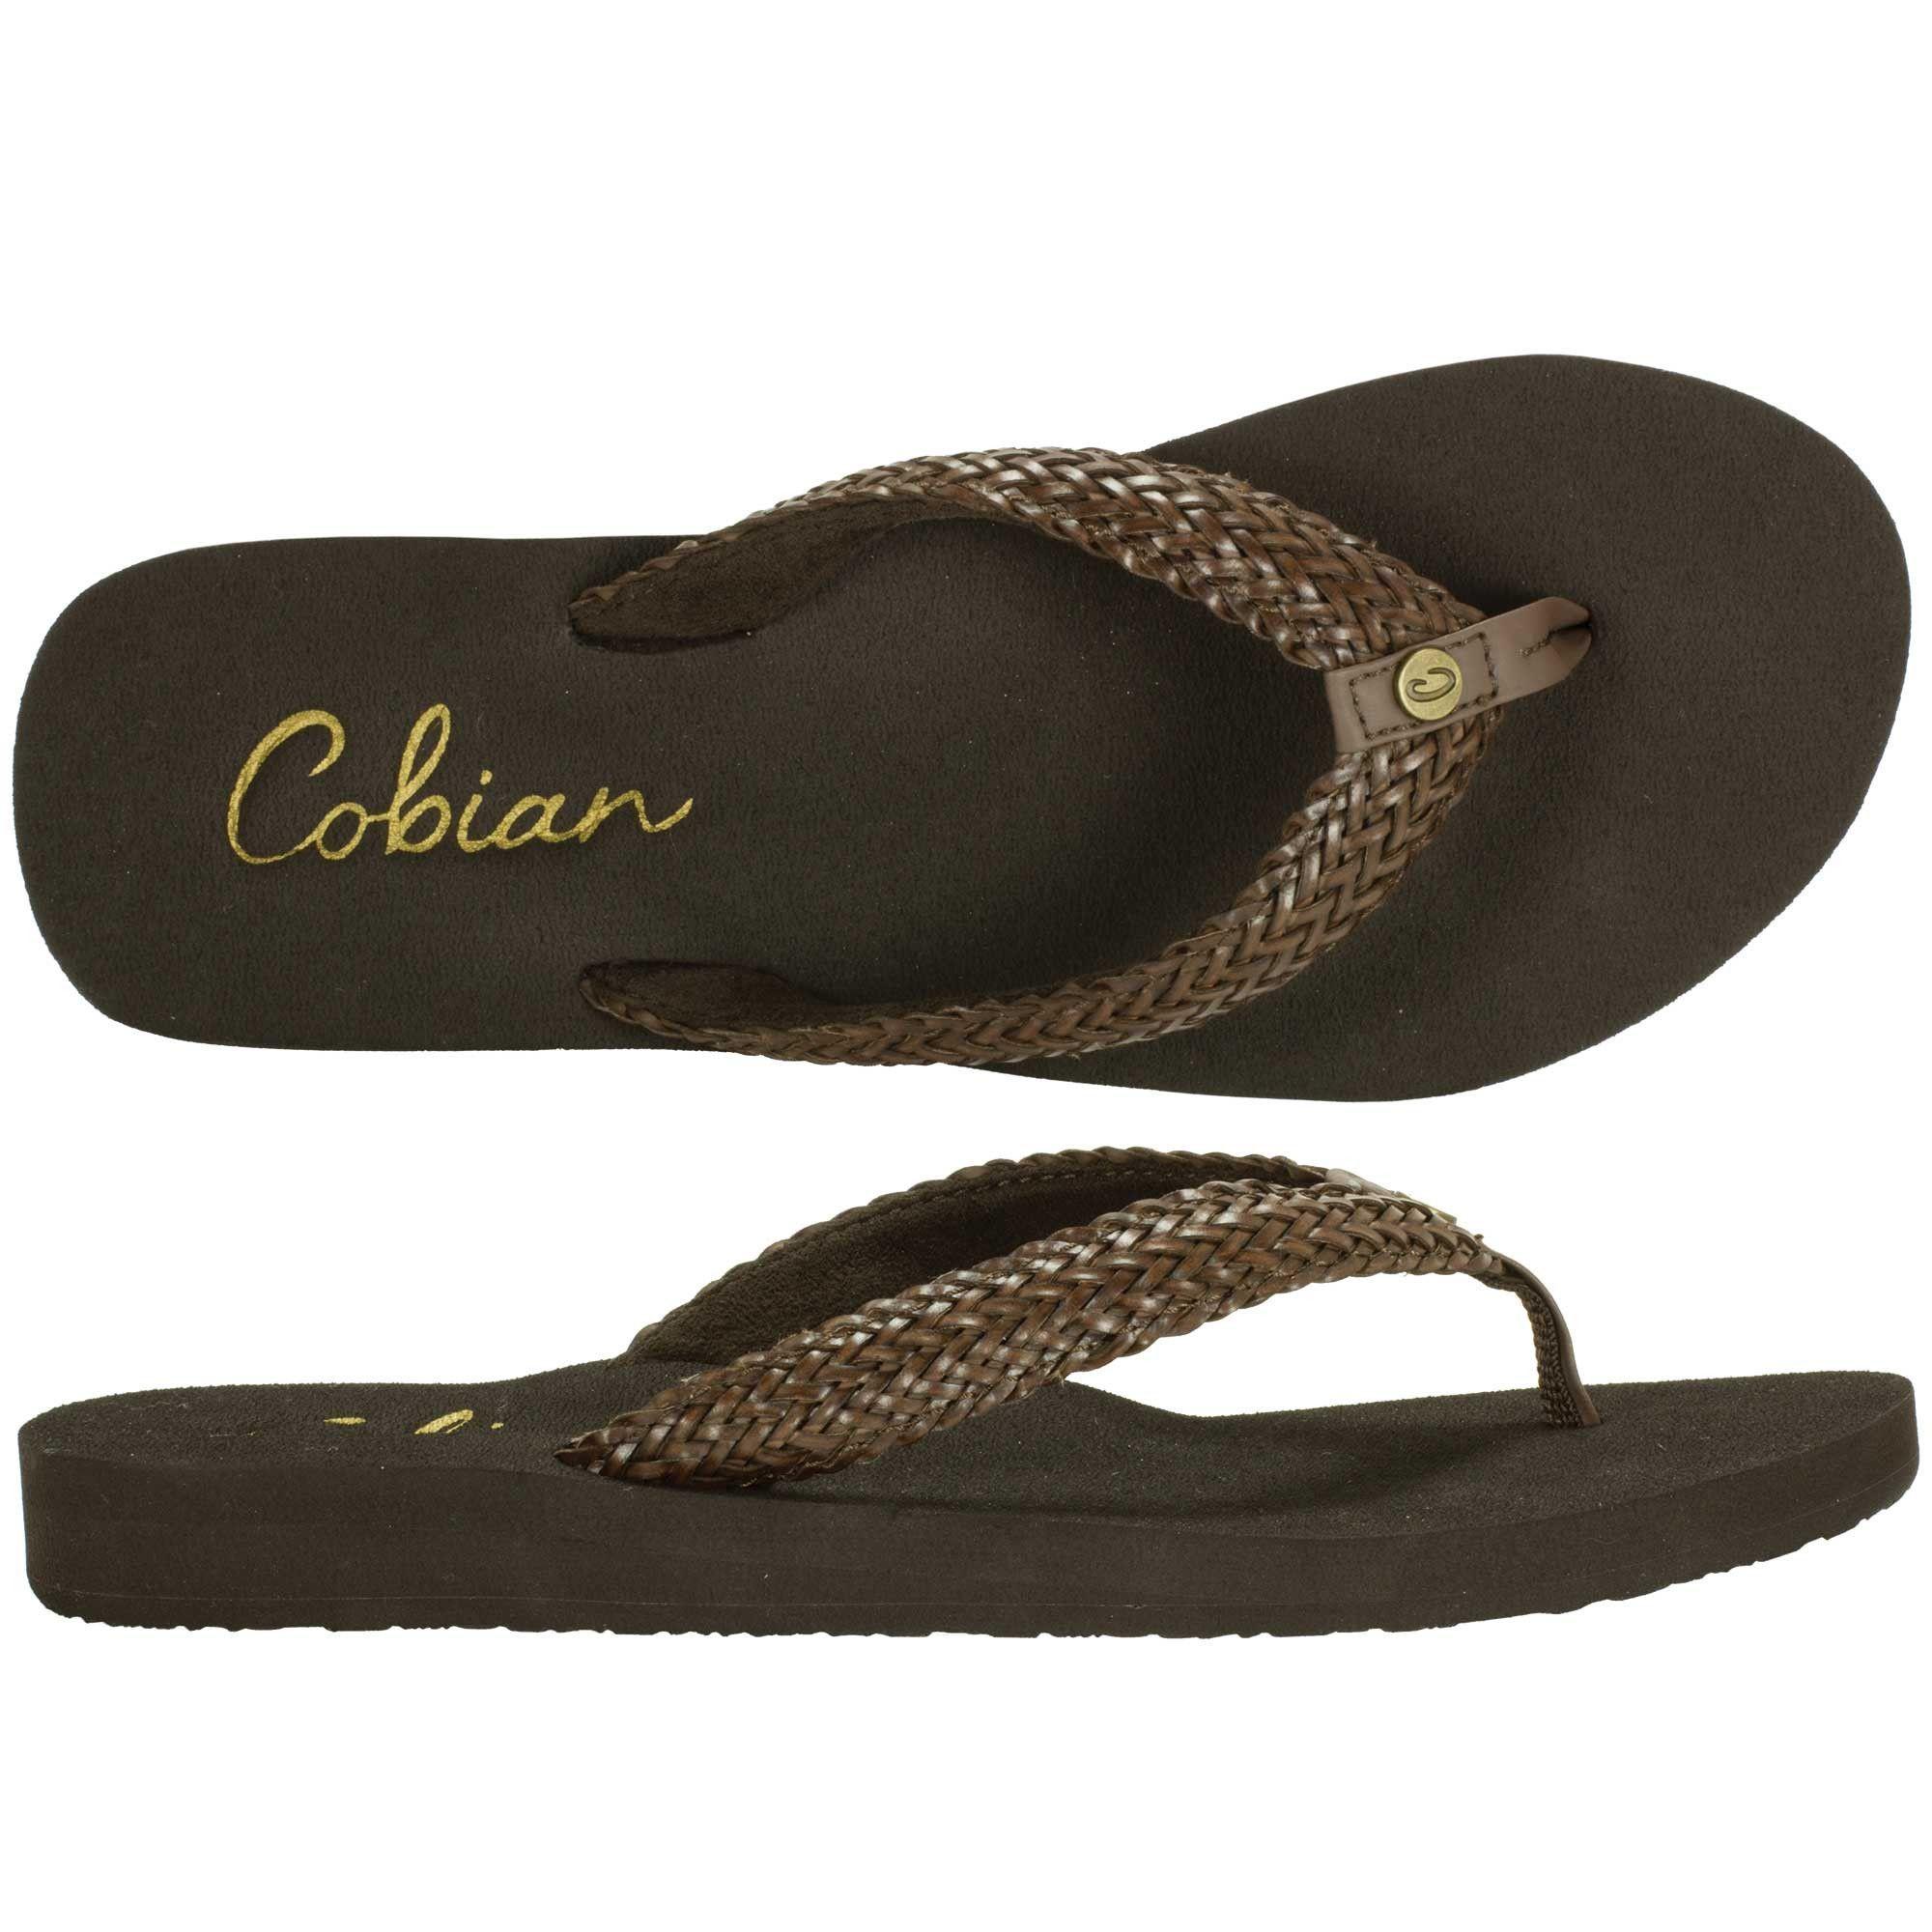 75c018fb7 Cobian Womens Sandals Lalati